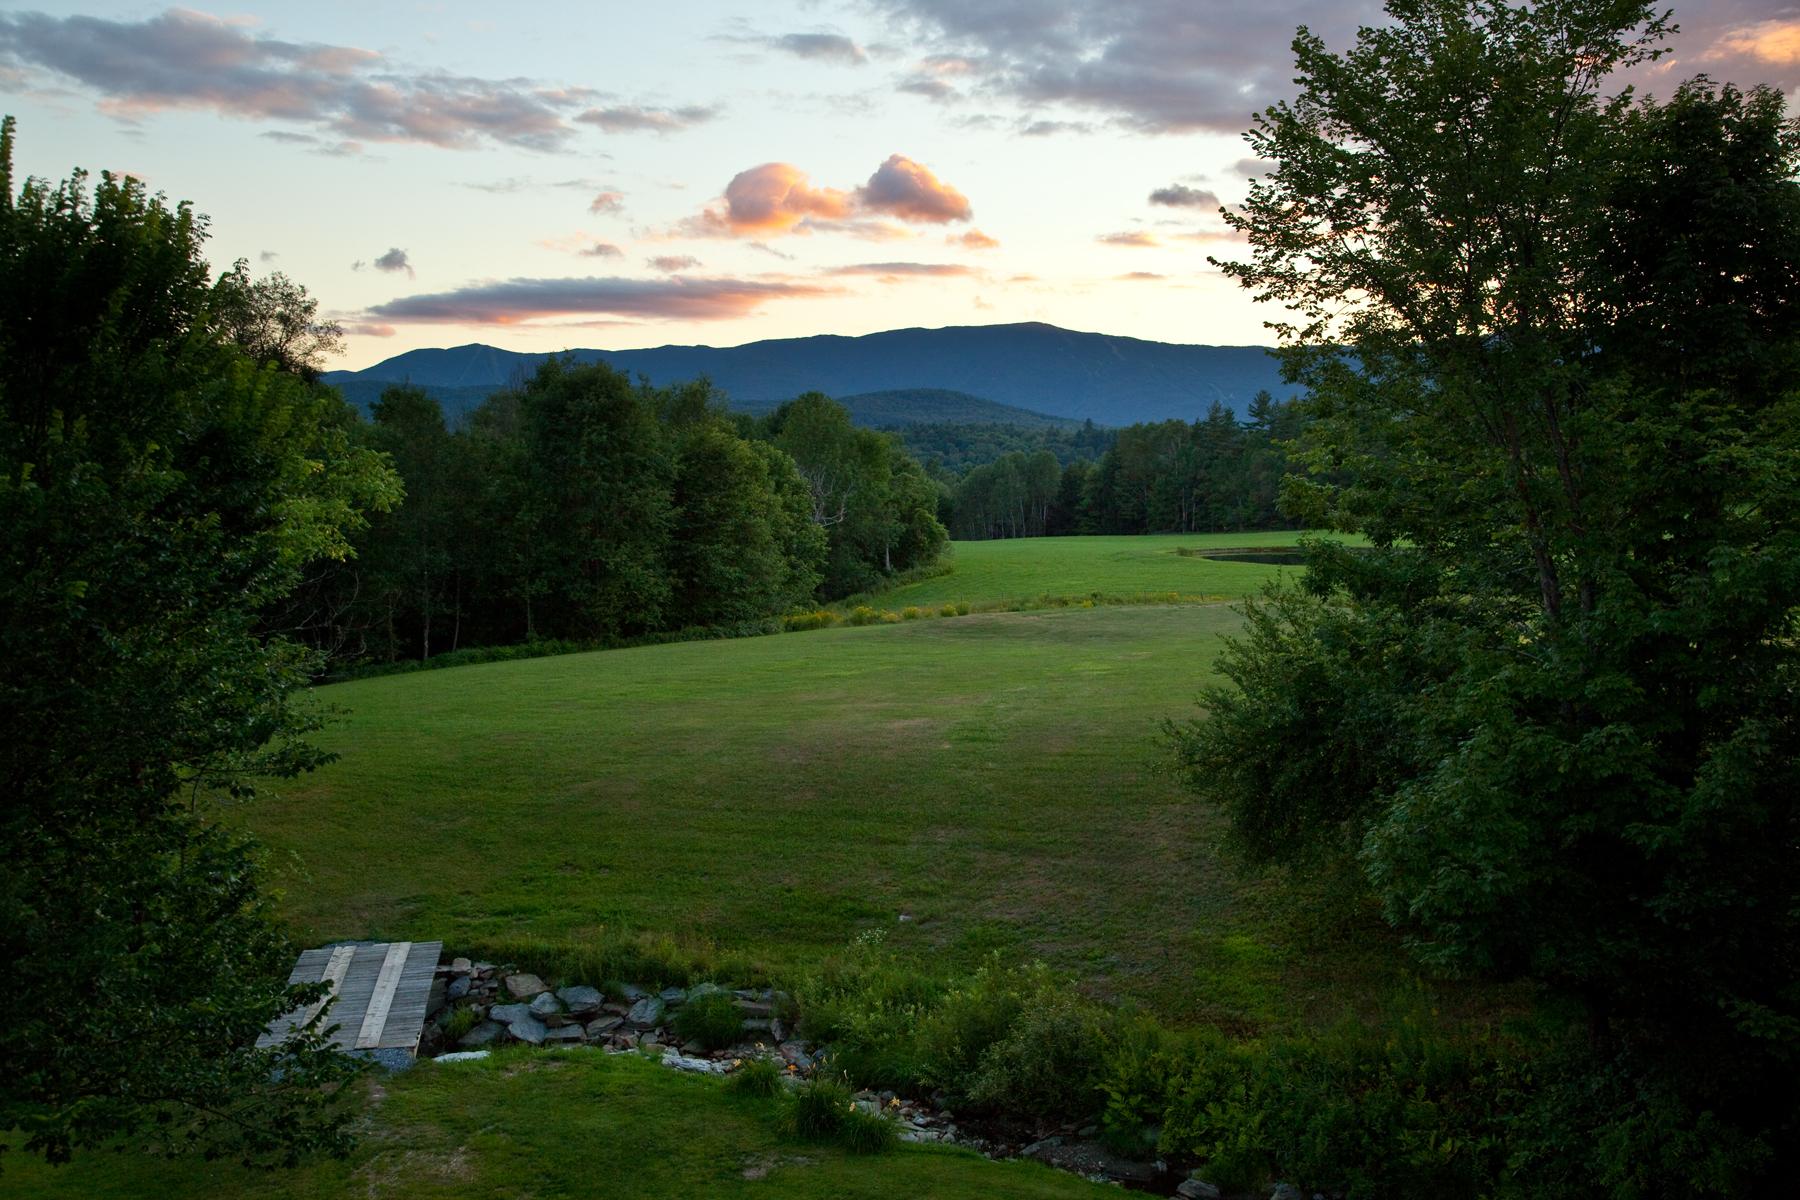 the back meadow • david garten-vtwedding.com